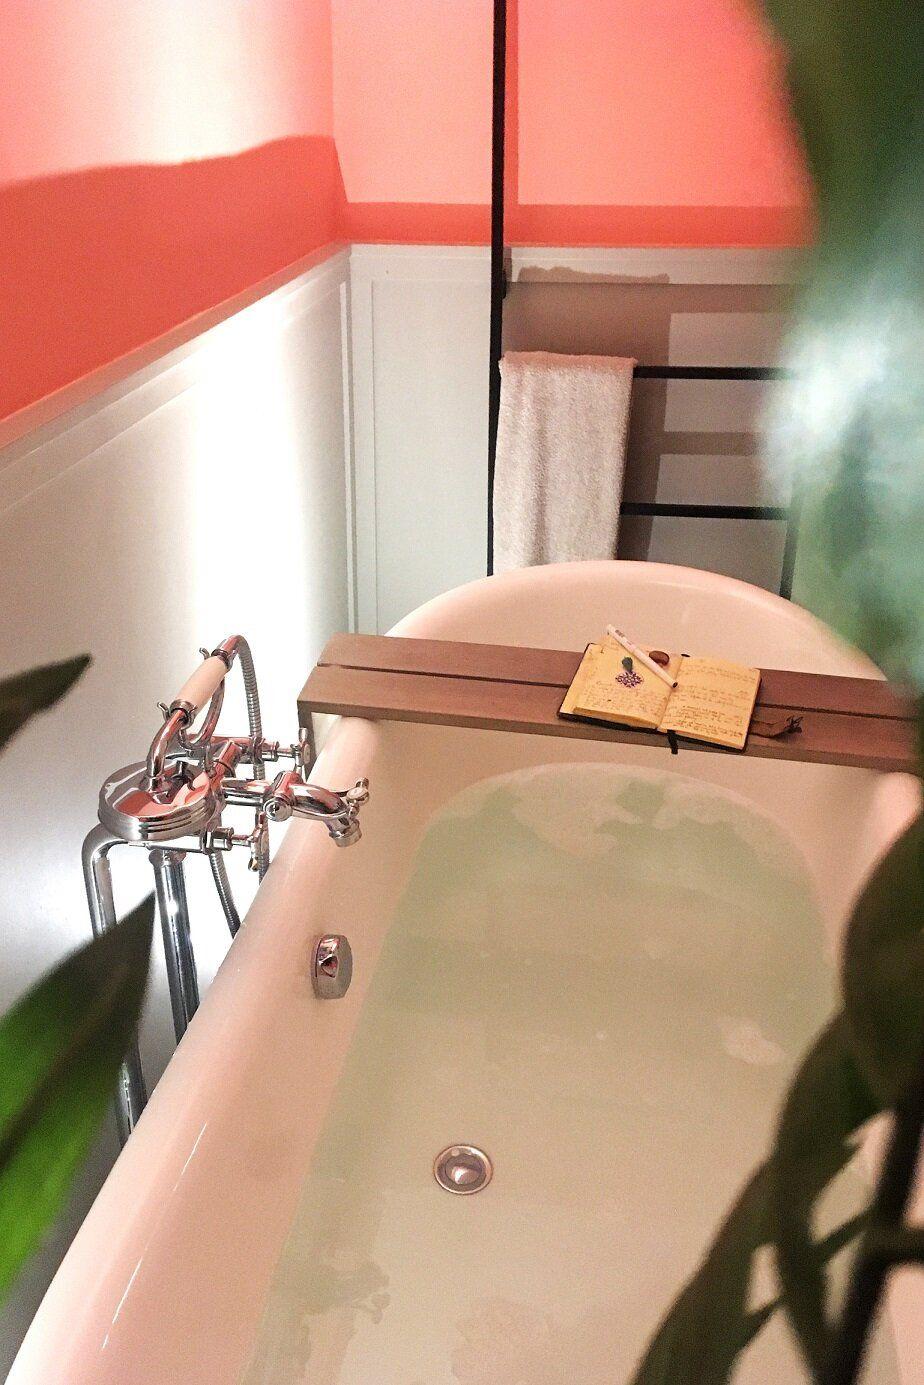 Travel In Mauritius Luxury Vs Ballin On A Budget Mauritius Hotels Vintage Bathtub Mauritius